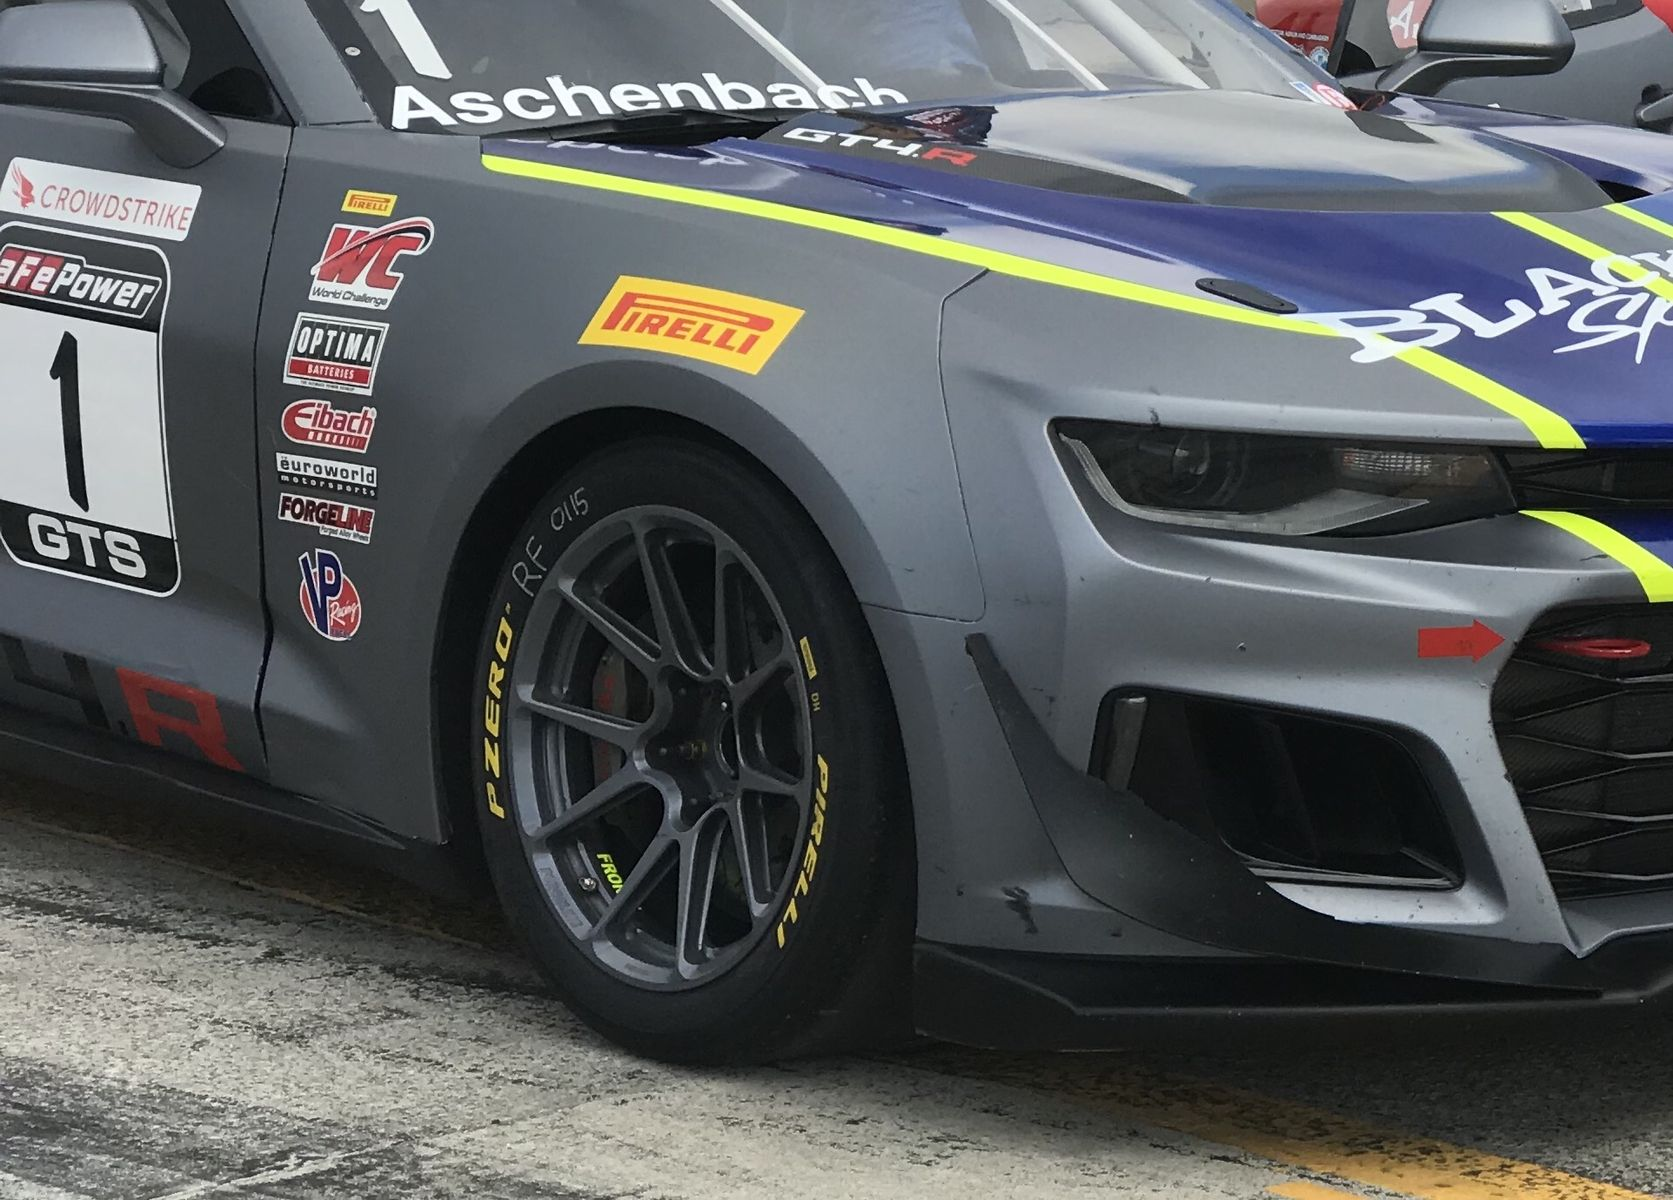 2018 Chevrolet Camaro | Aschenbach Dominates Pirelli World Challenge GTS at Canadian Tire Motorsports Park on Forgeline One Piece Forged Monoblock GS1R Wheels!